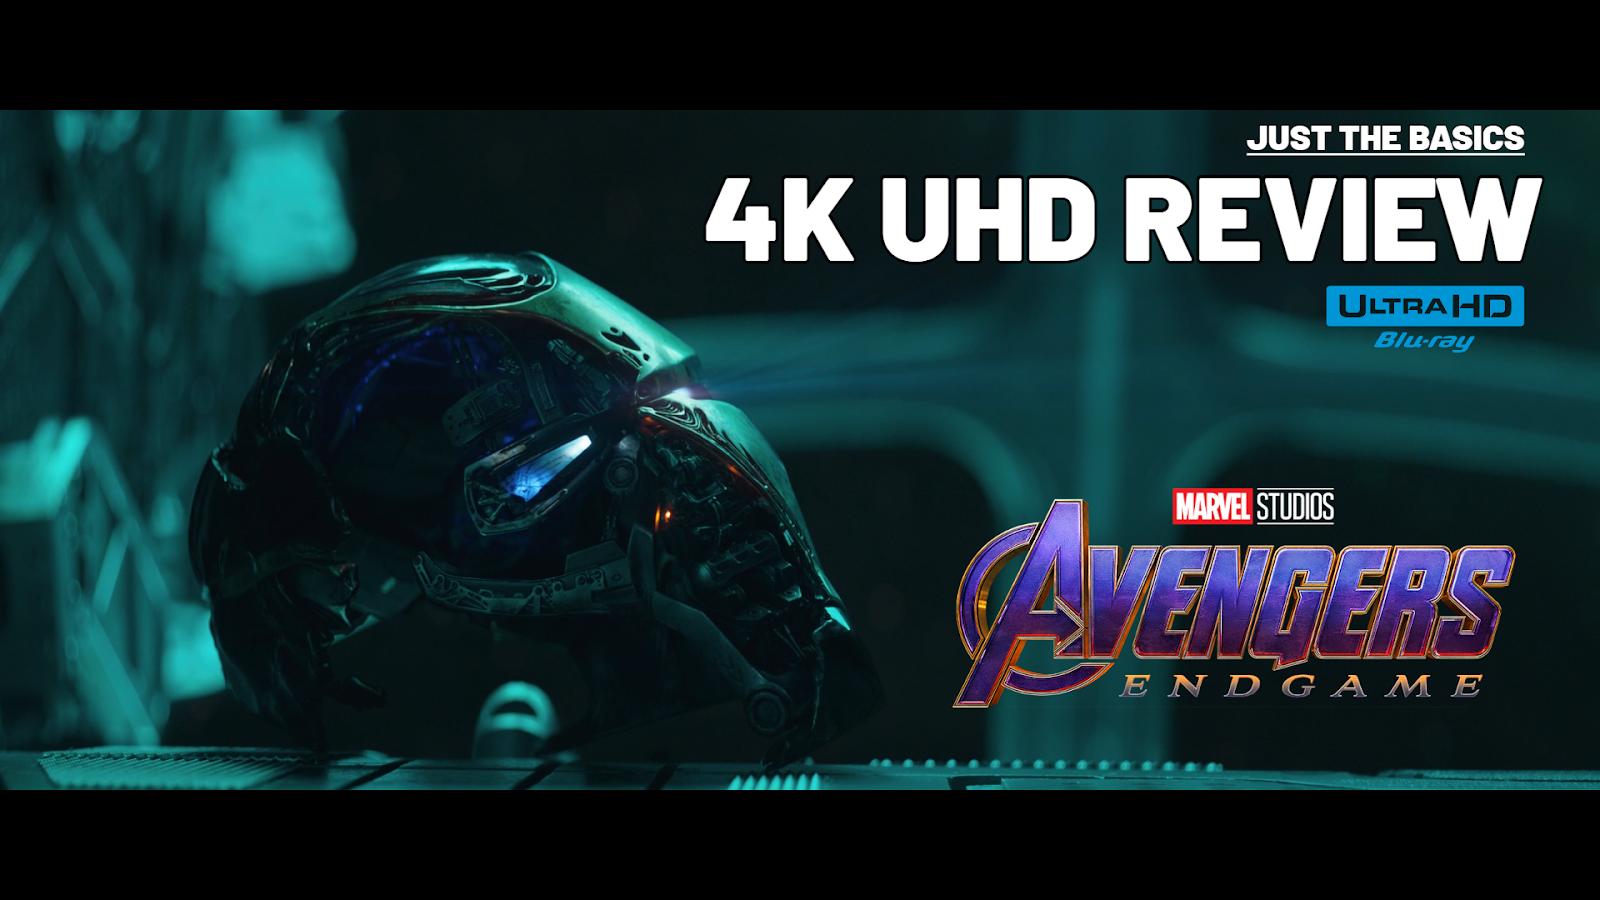 Avengers: Endgame (2019) 4K Ultra HD Blu-ray Blu-ray Review